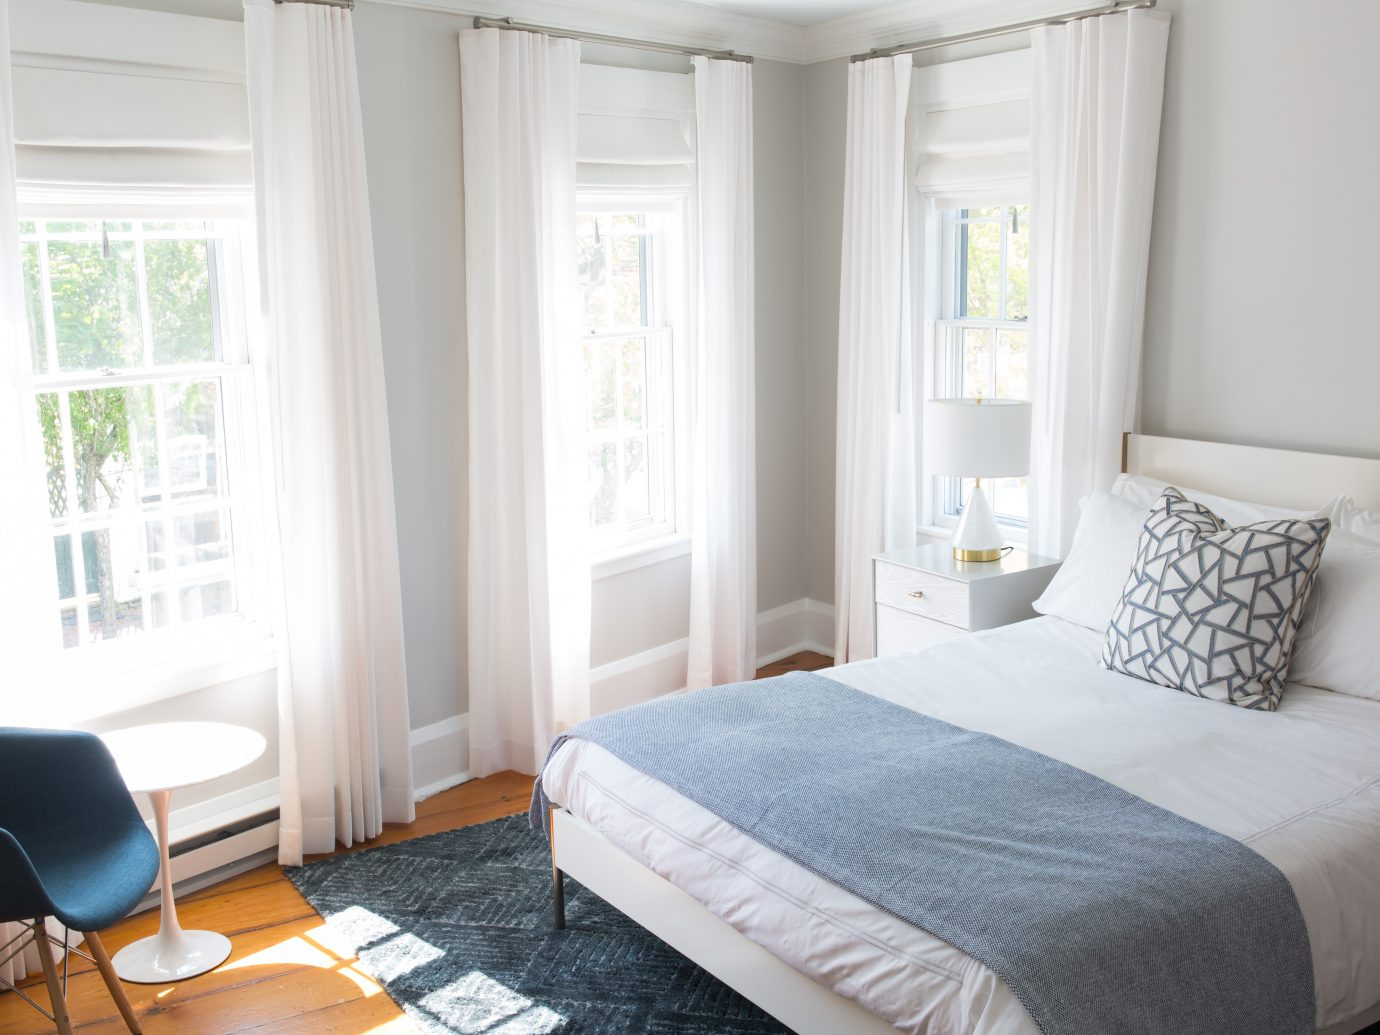 Bedroom at Hotel Pippa